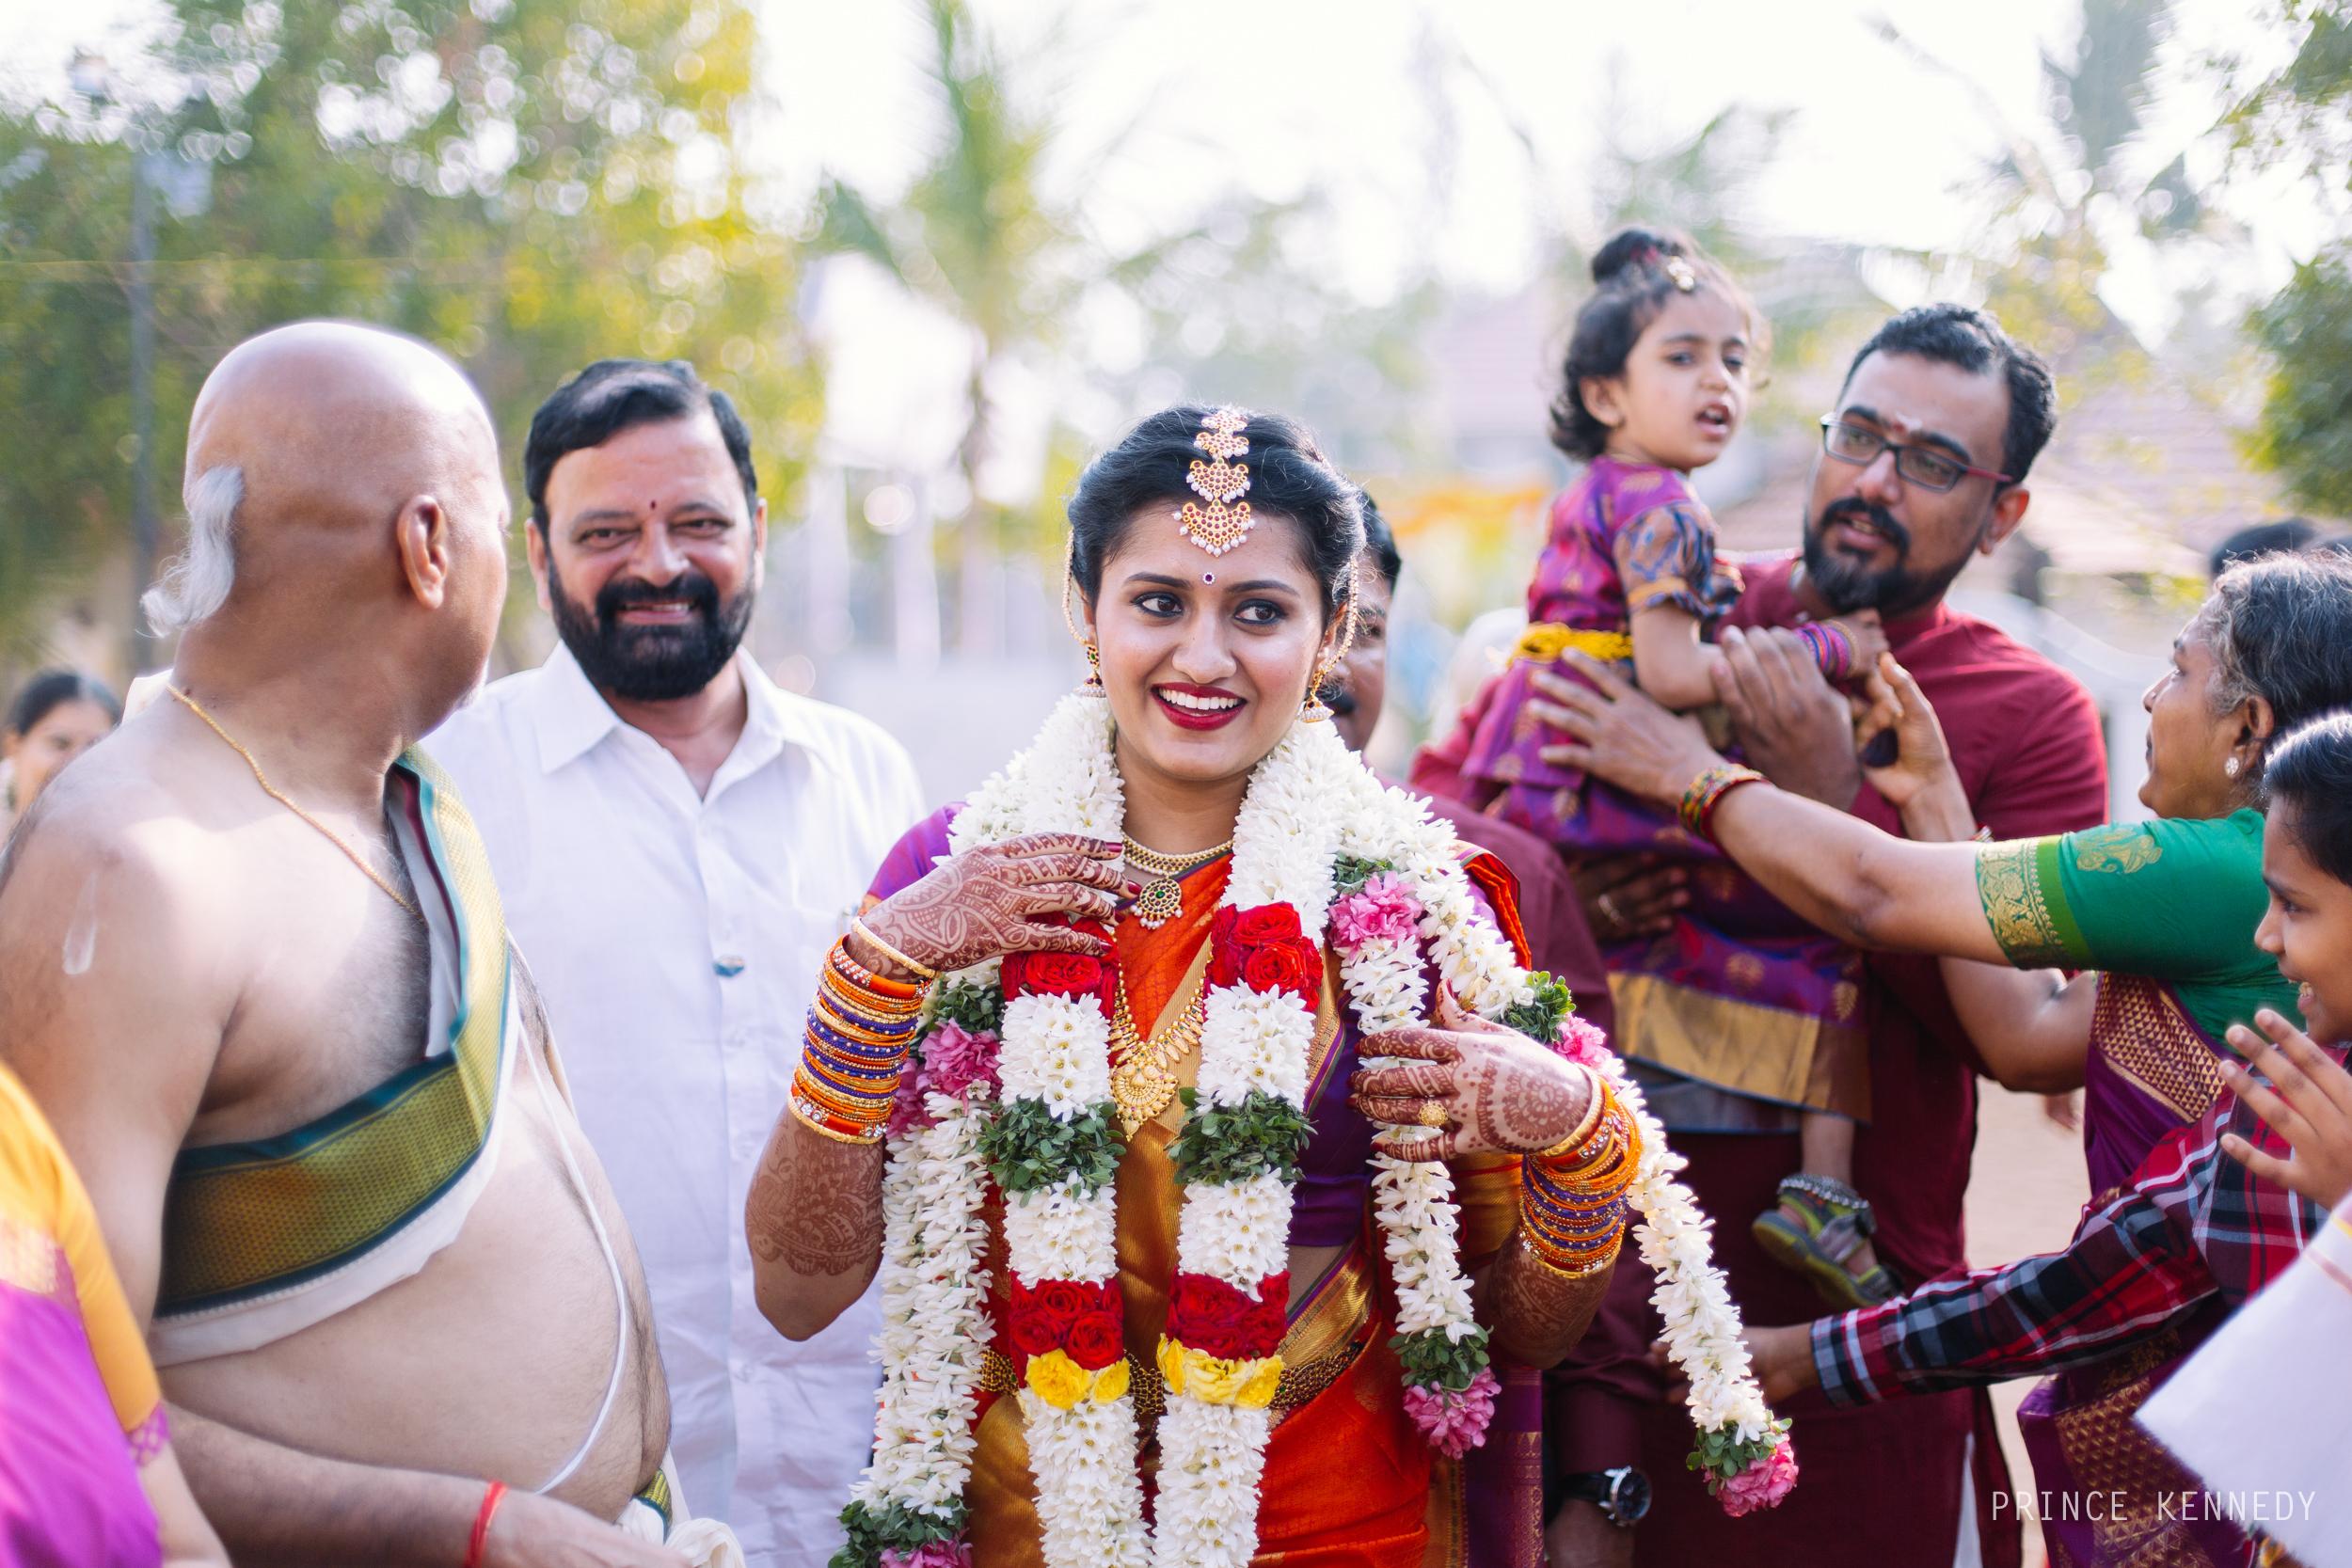 Athmajja-Nithesh-Engagement-Couple-Portrait-Portraiture-Wedding-Couple-Portrait-Chennai-Photographer-Candid-Photography-Destination-Best-Prince-Kennedy-Photography-81.jpg